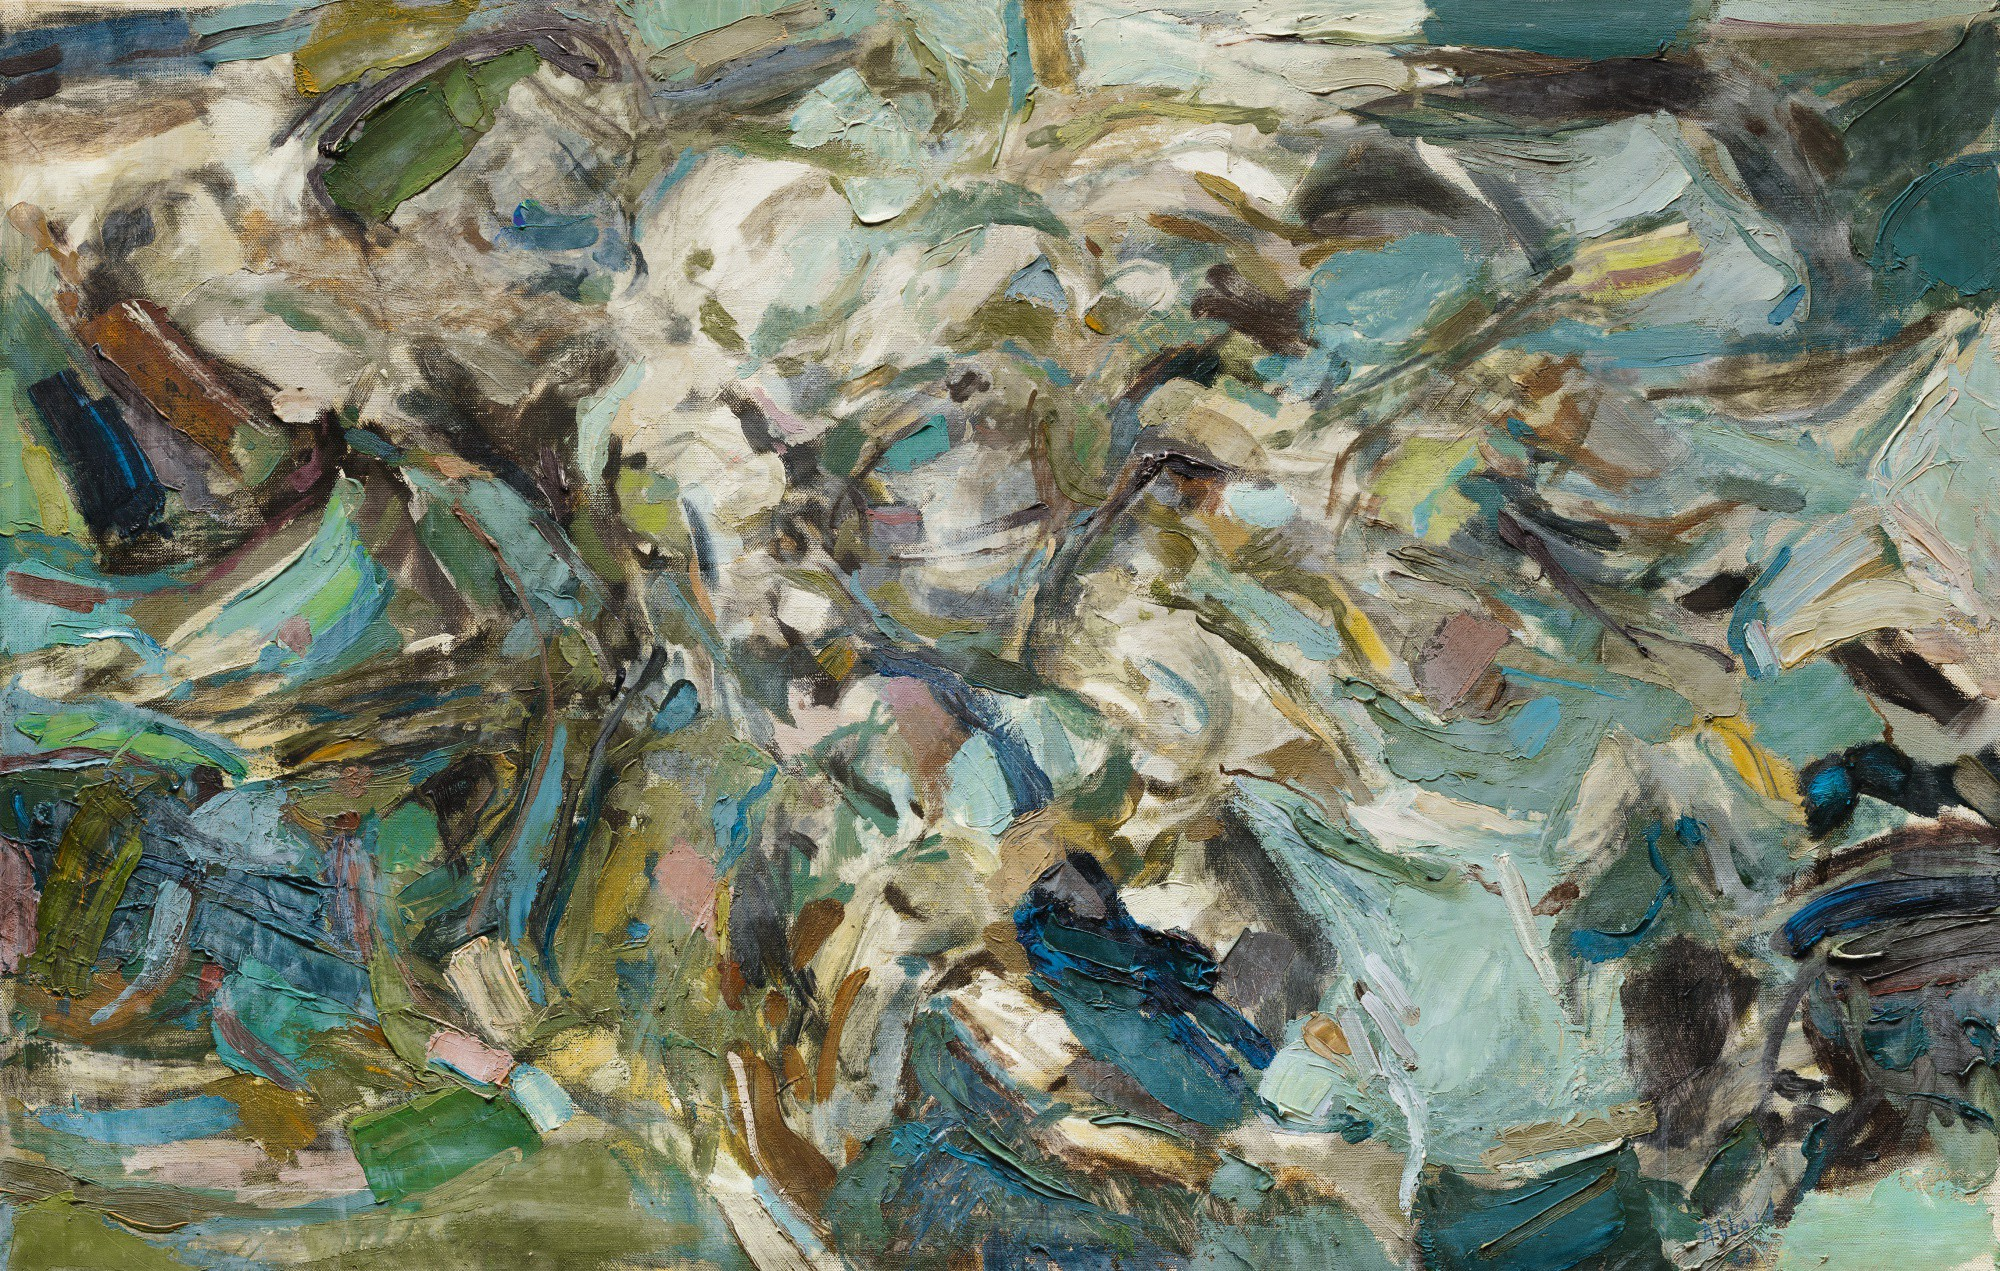 SHAFIC ABBOUD | BLEUS ROMPUS (BROKEN BLUE), N°91